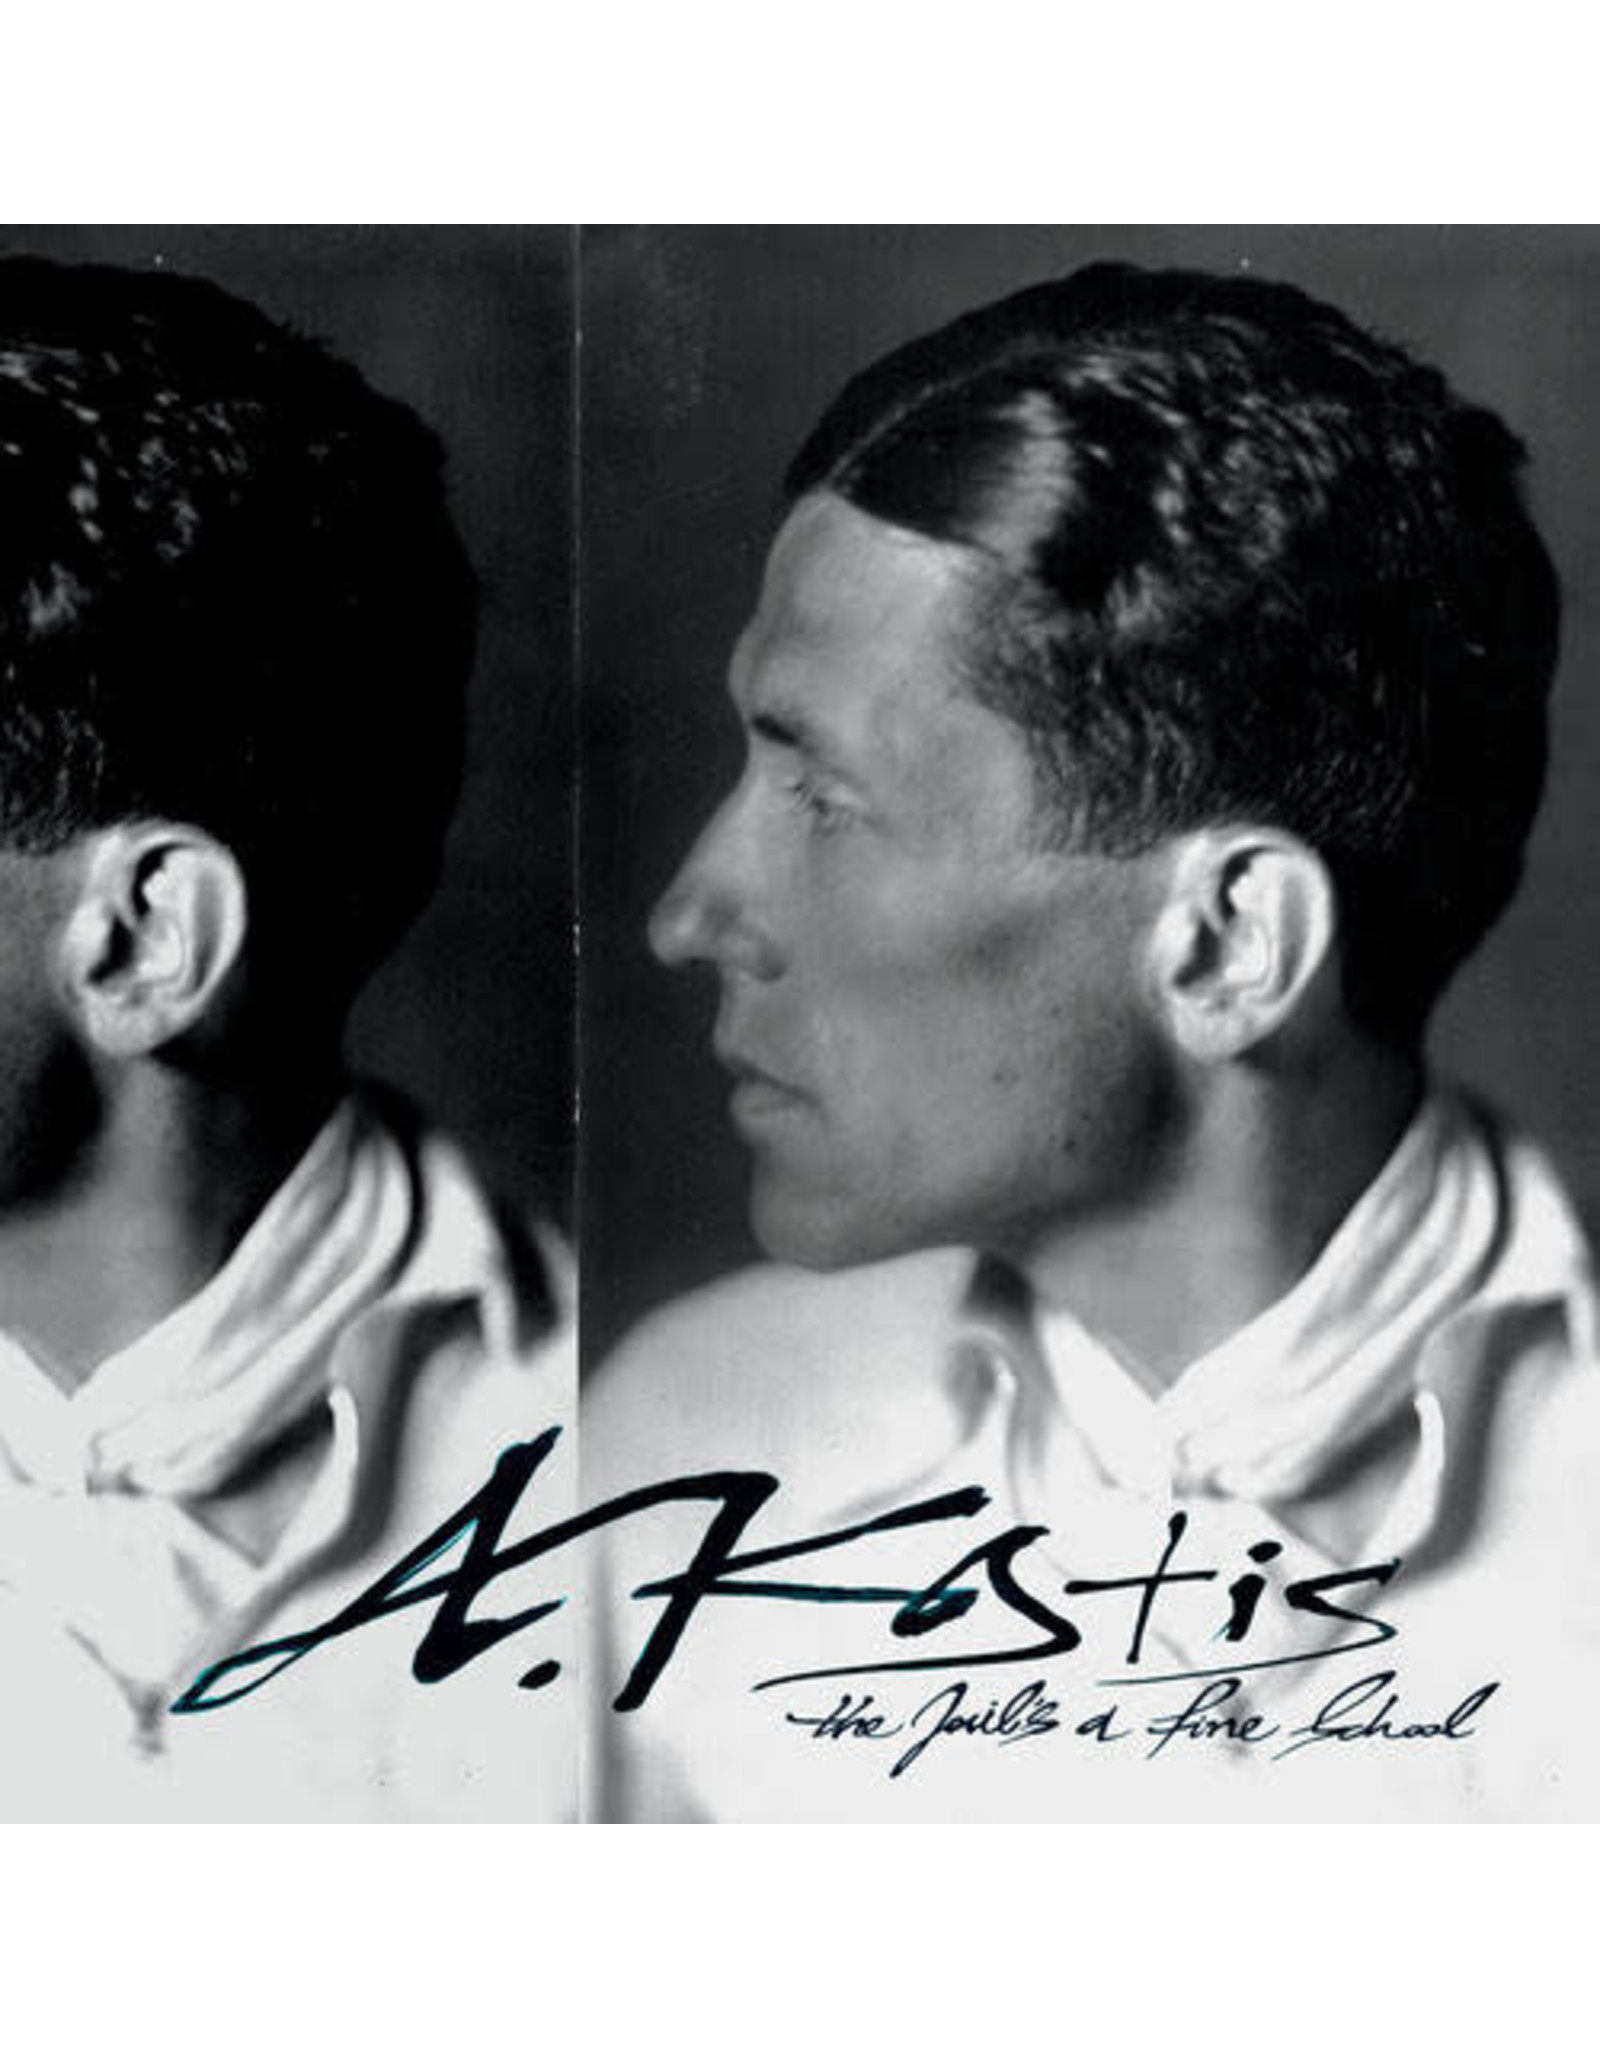 New Vinyl A. Kostis - The Jail's A Fine School LP